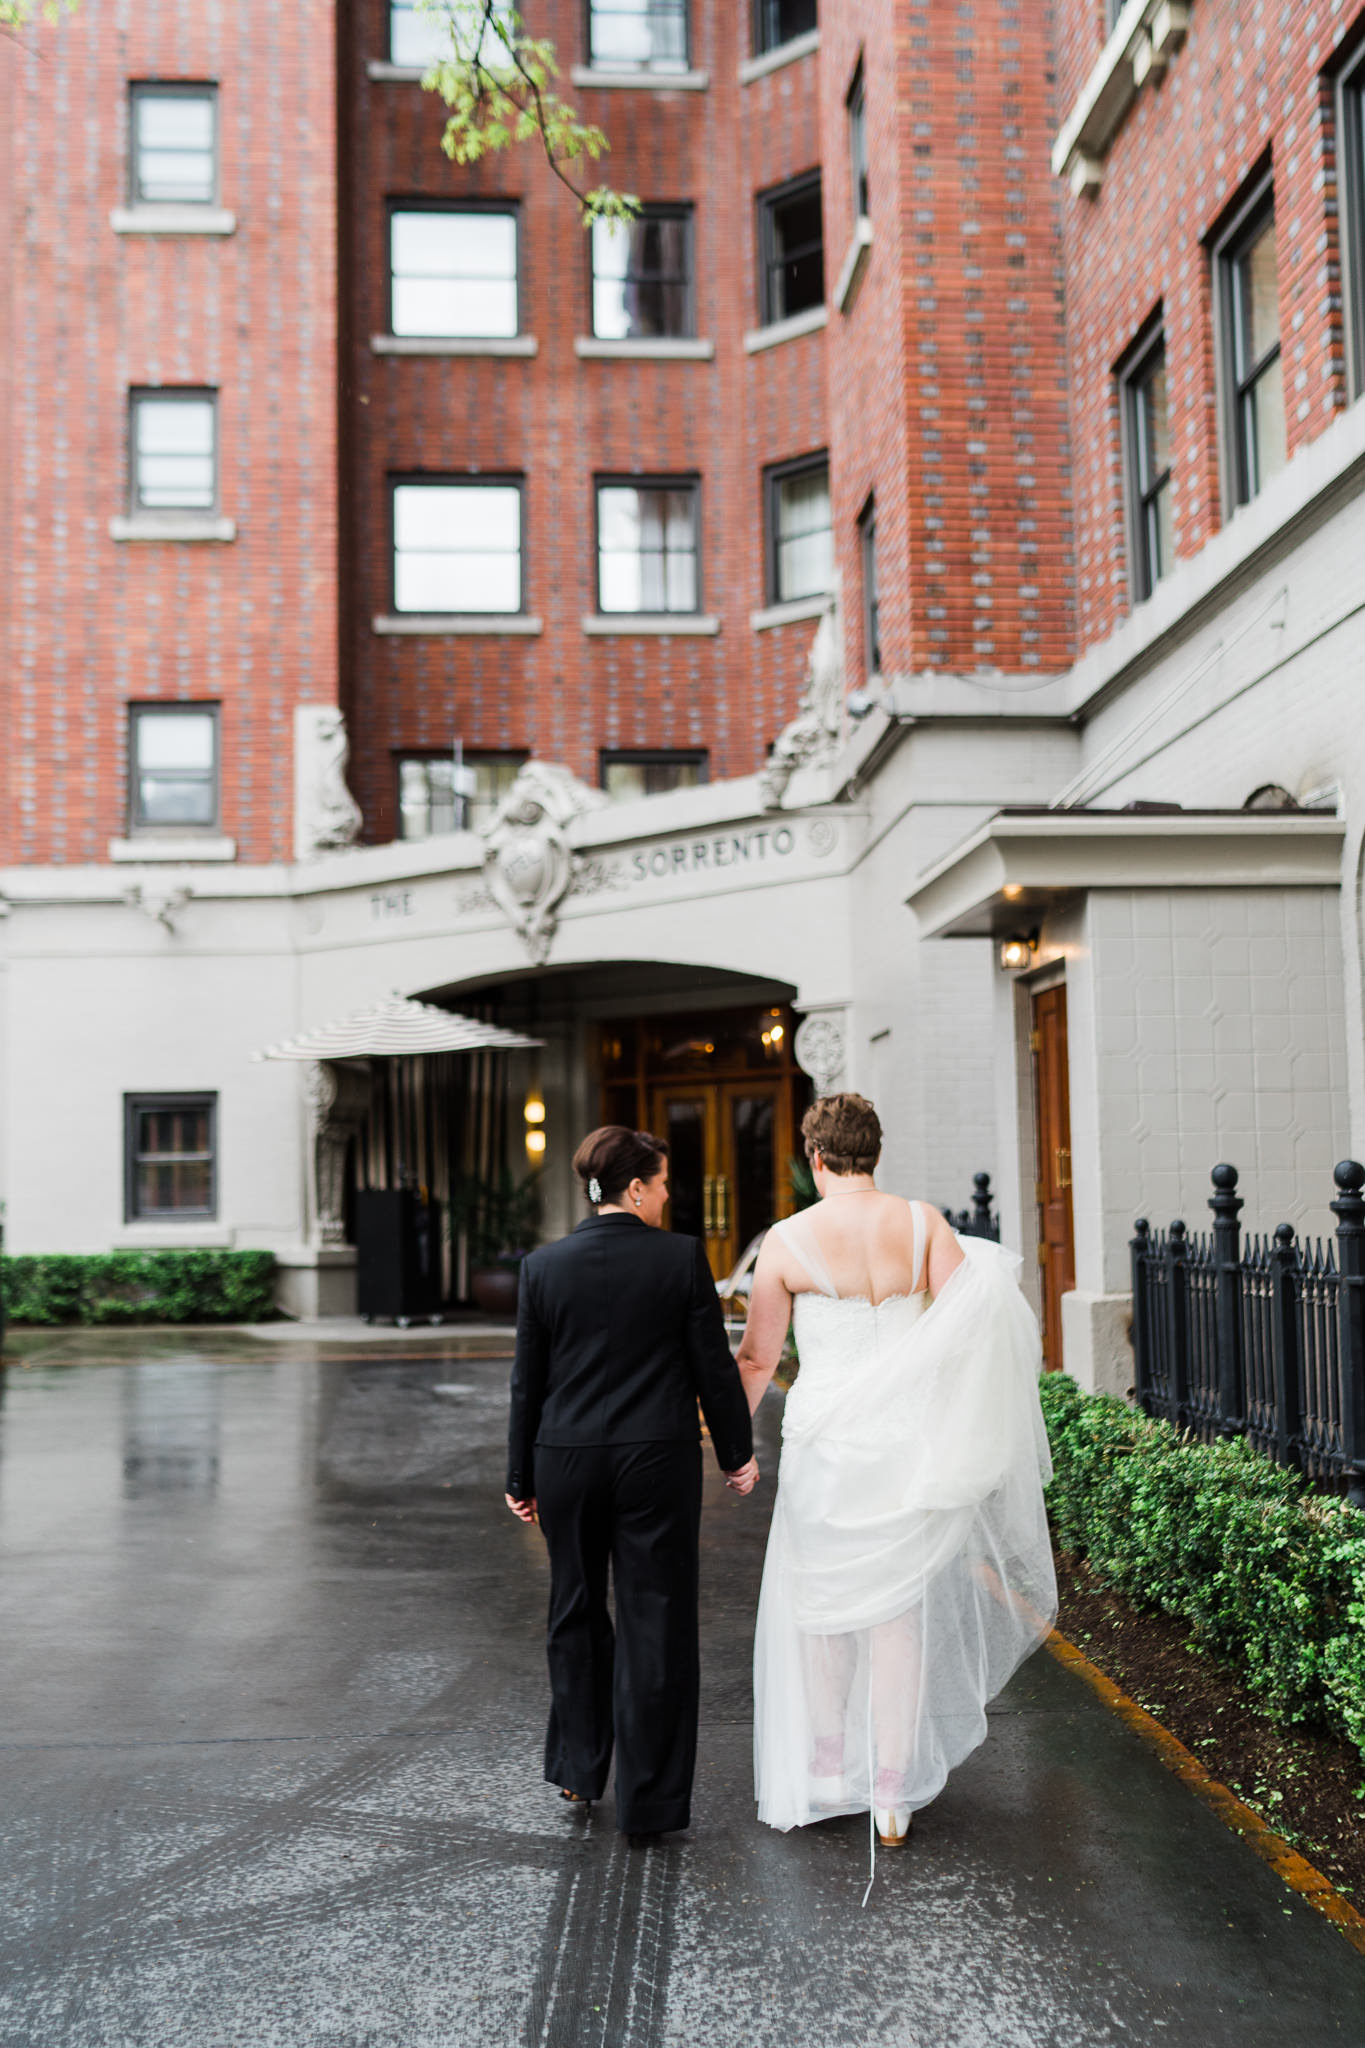 Hotel Sorrento Brides Seattle Wedding Photographer